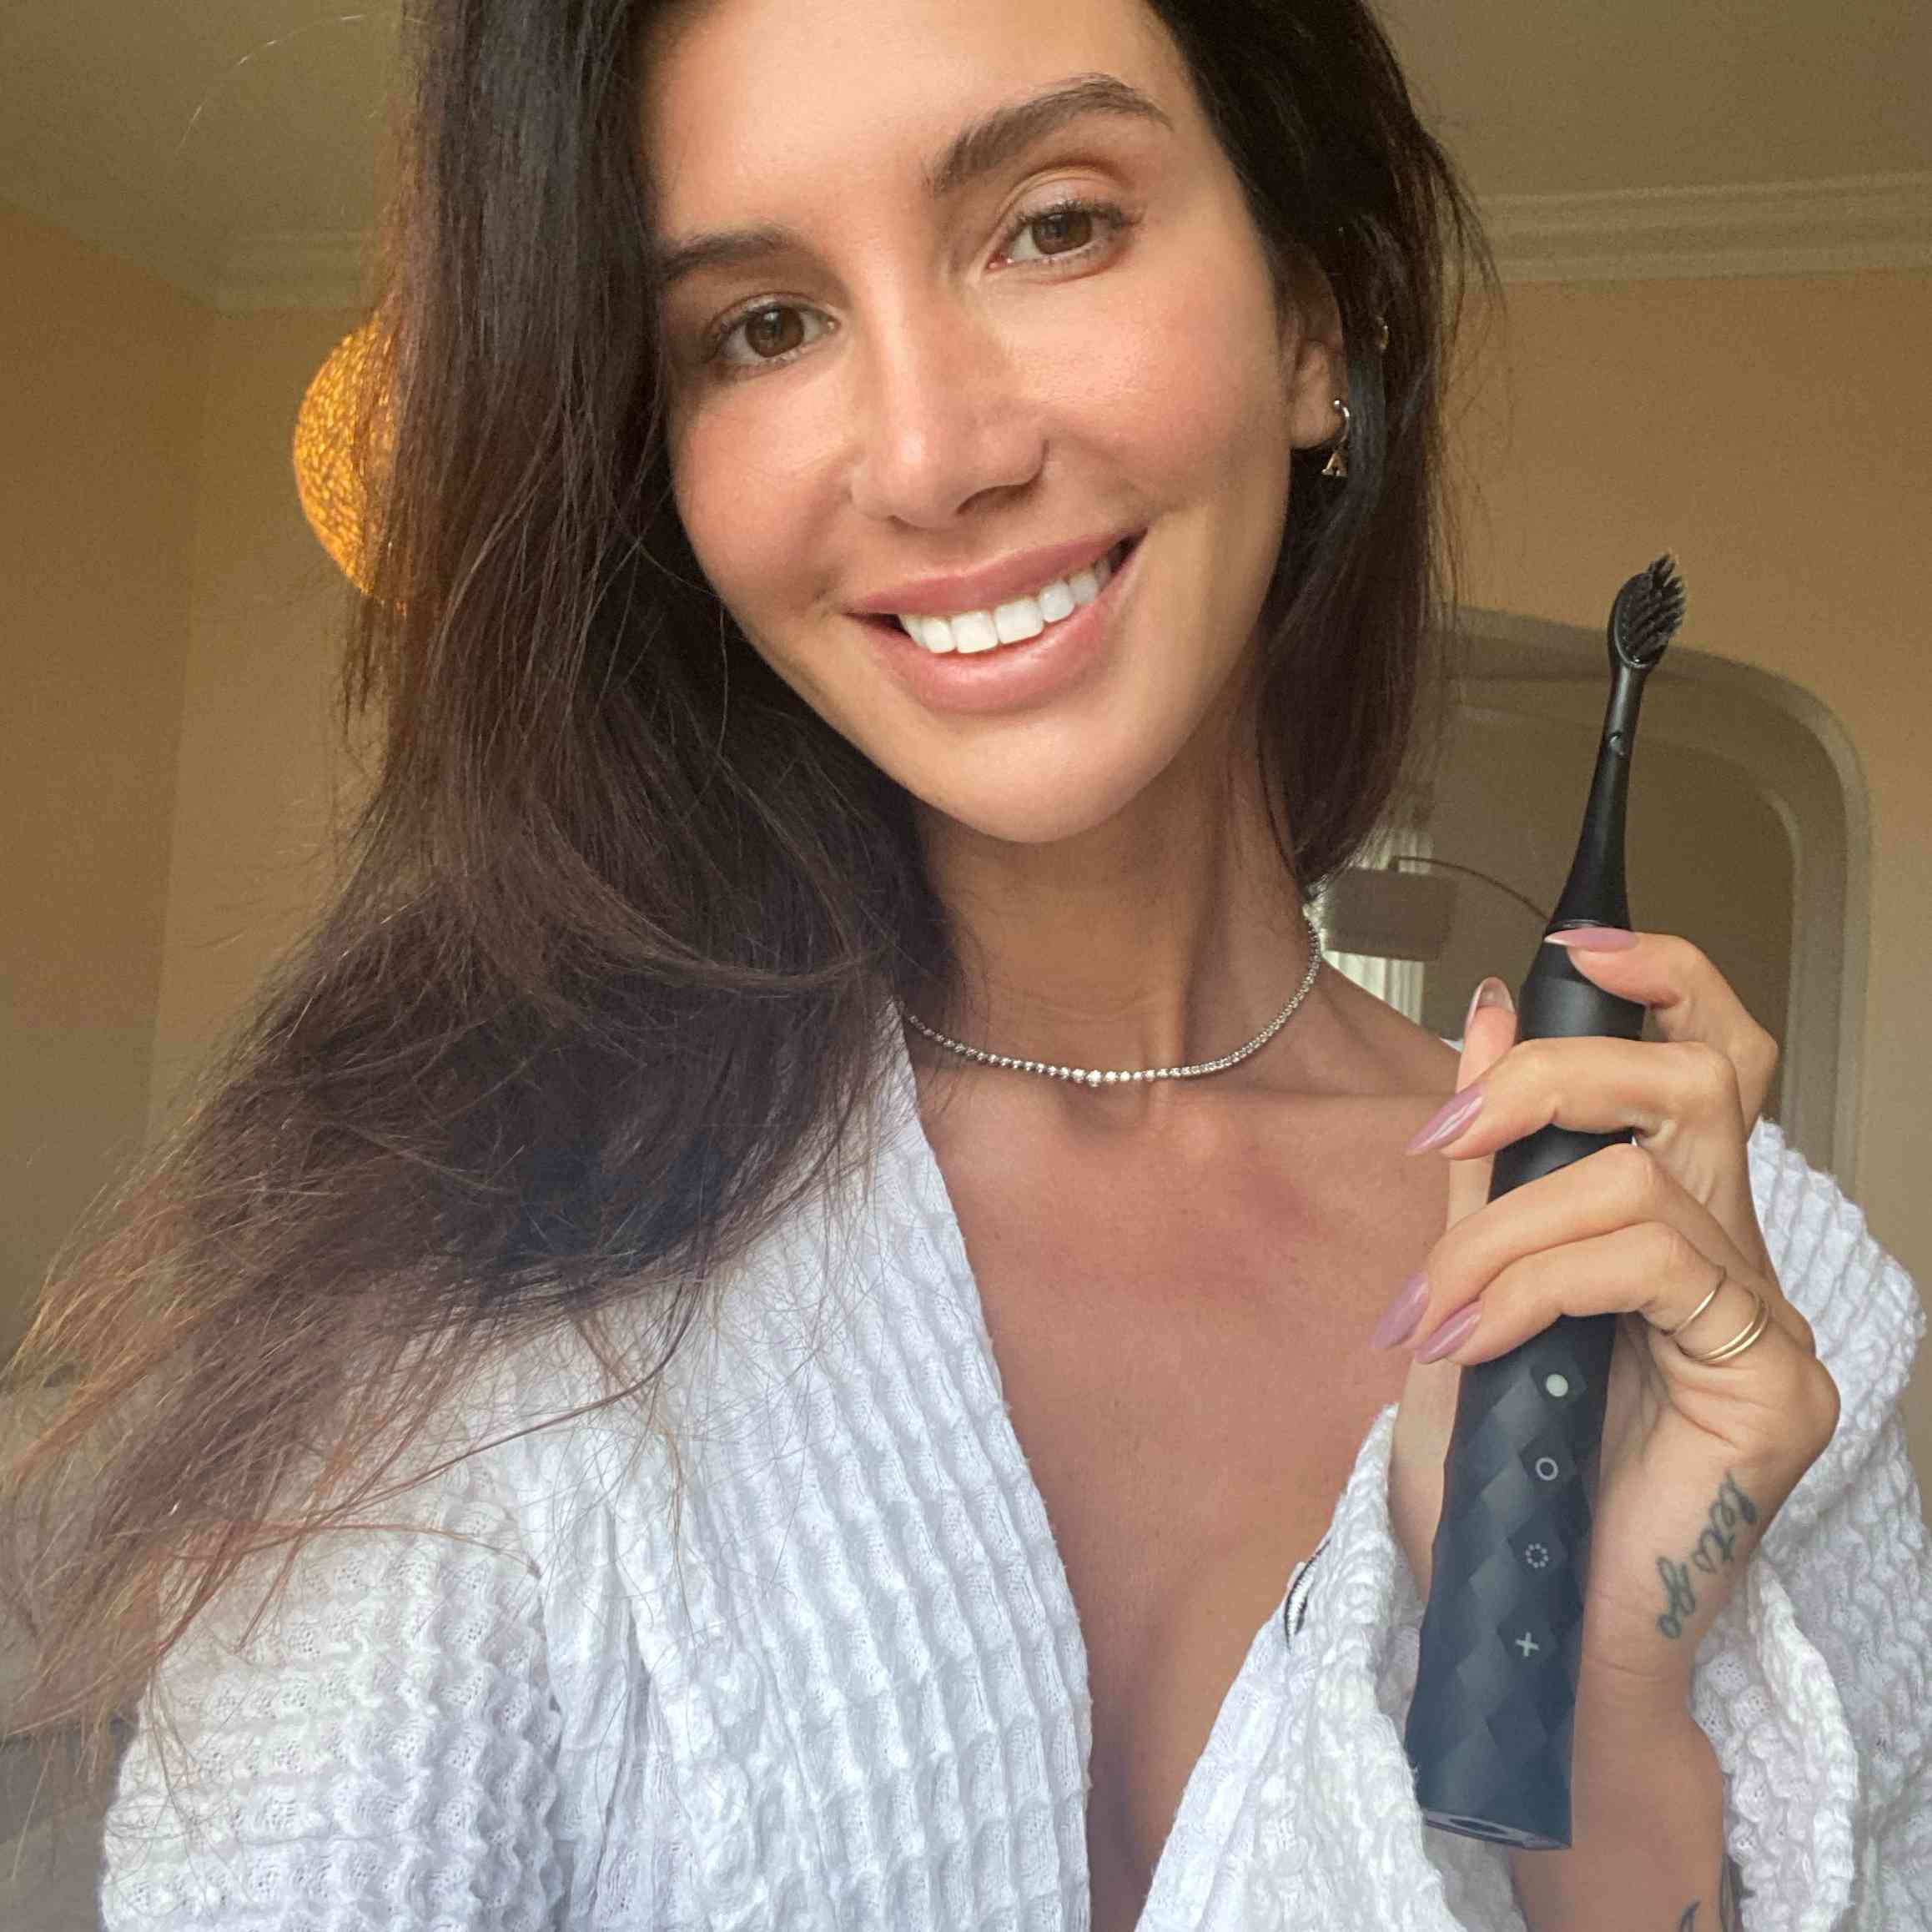 Burst toothbrush review